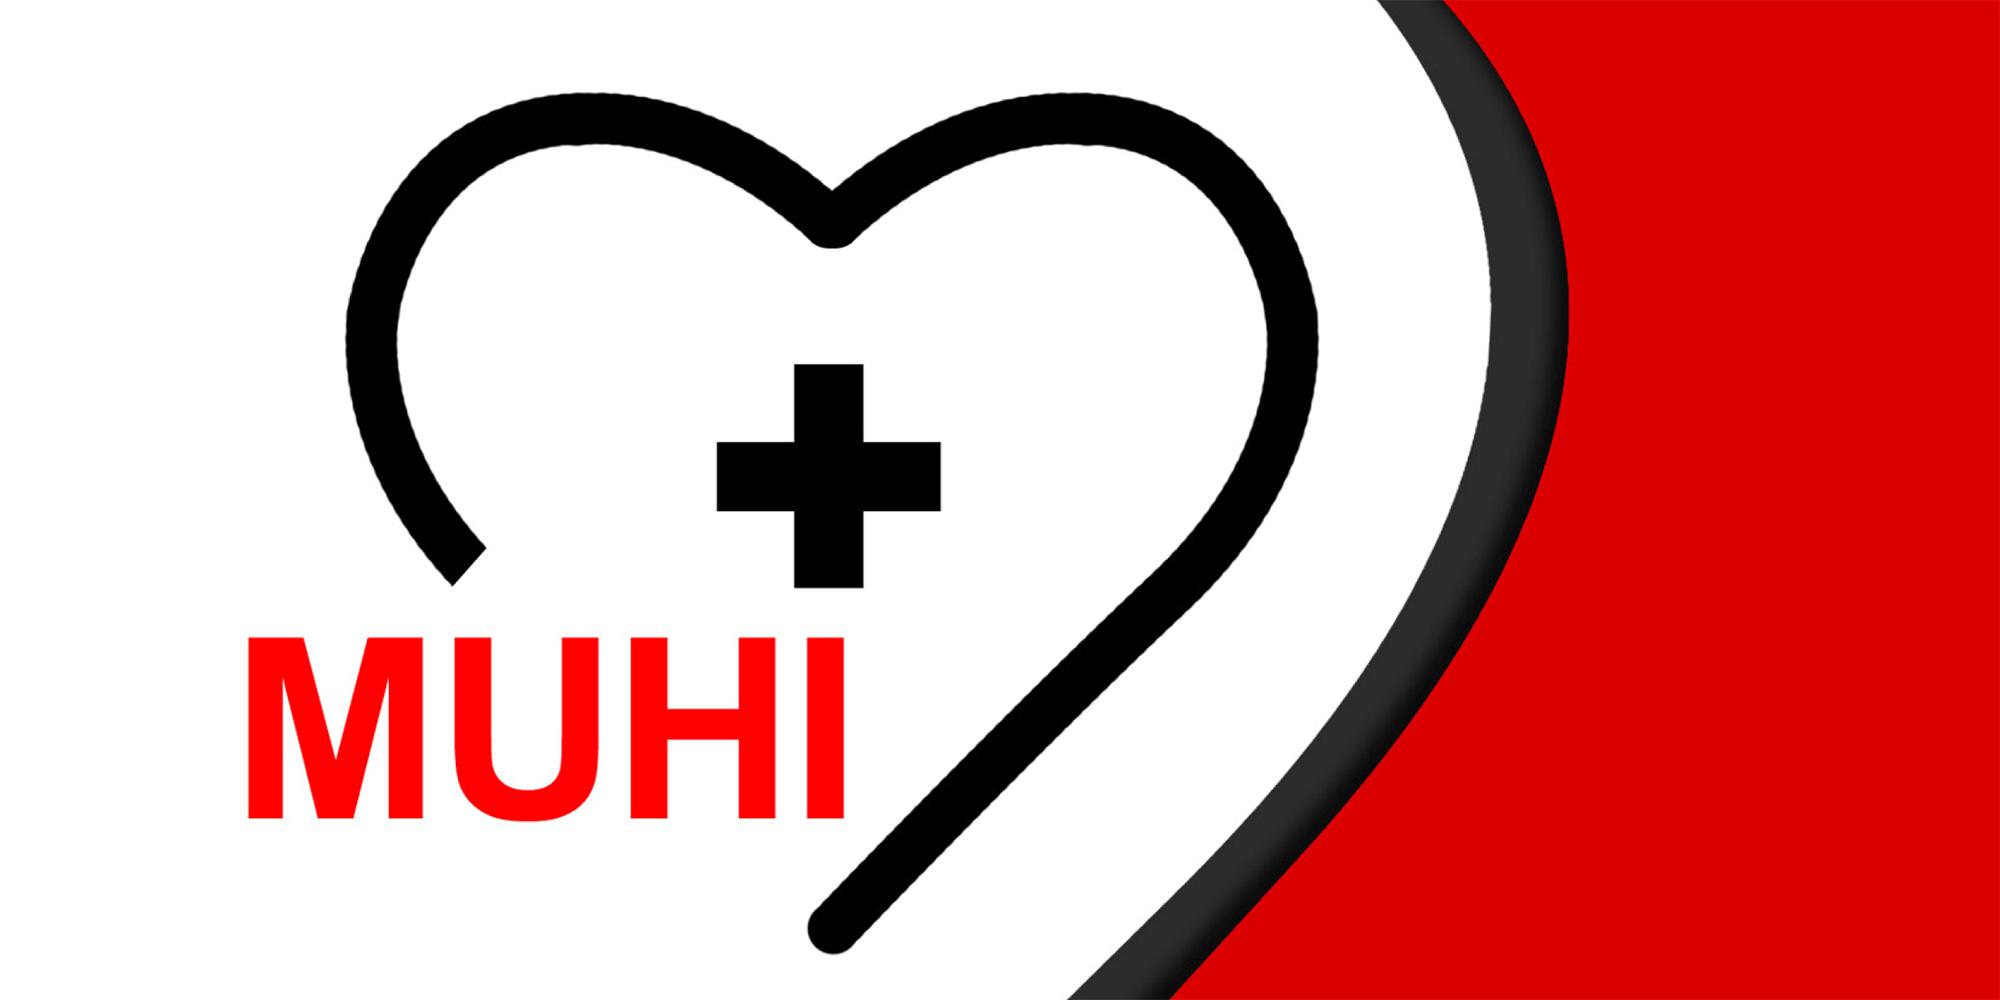 Melbourne University Health Initiative